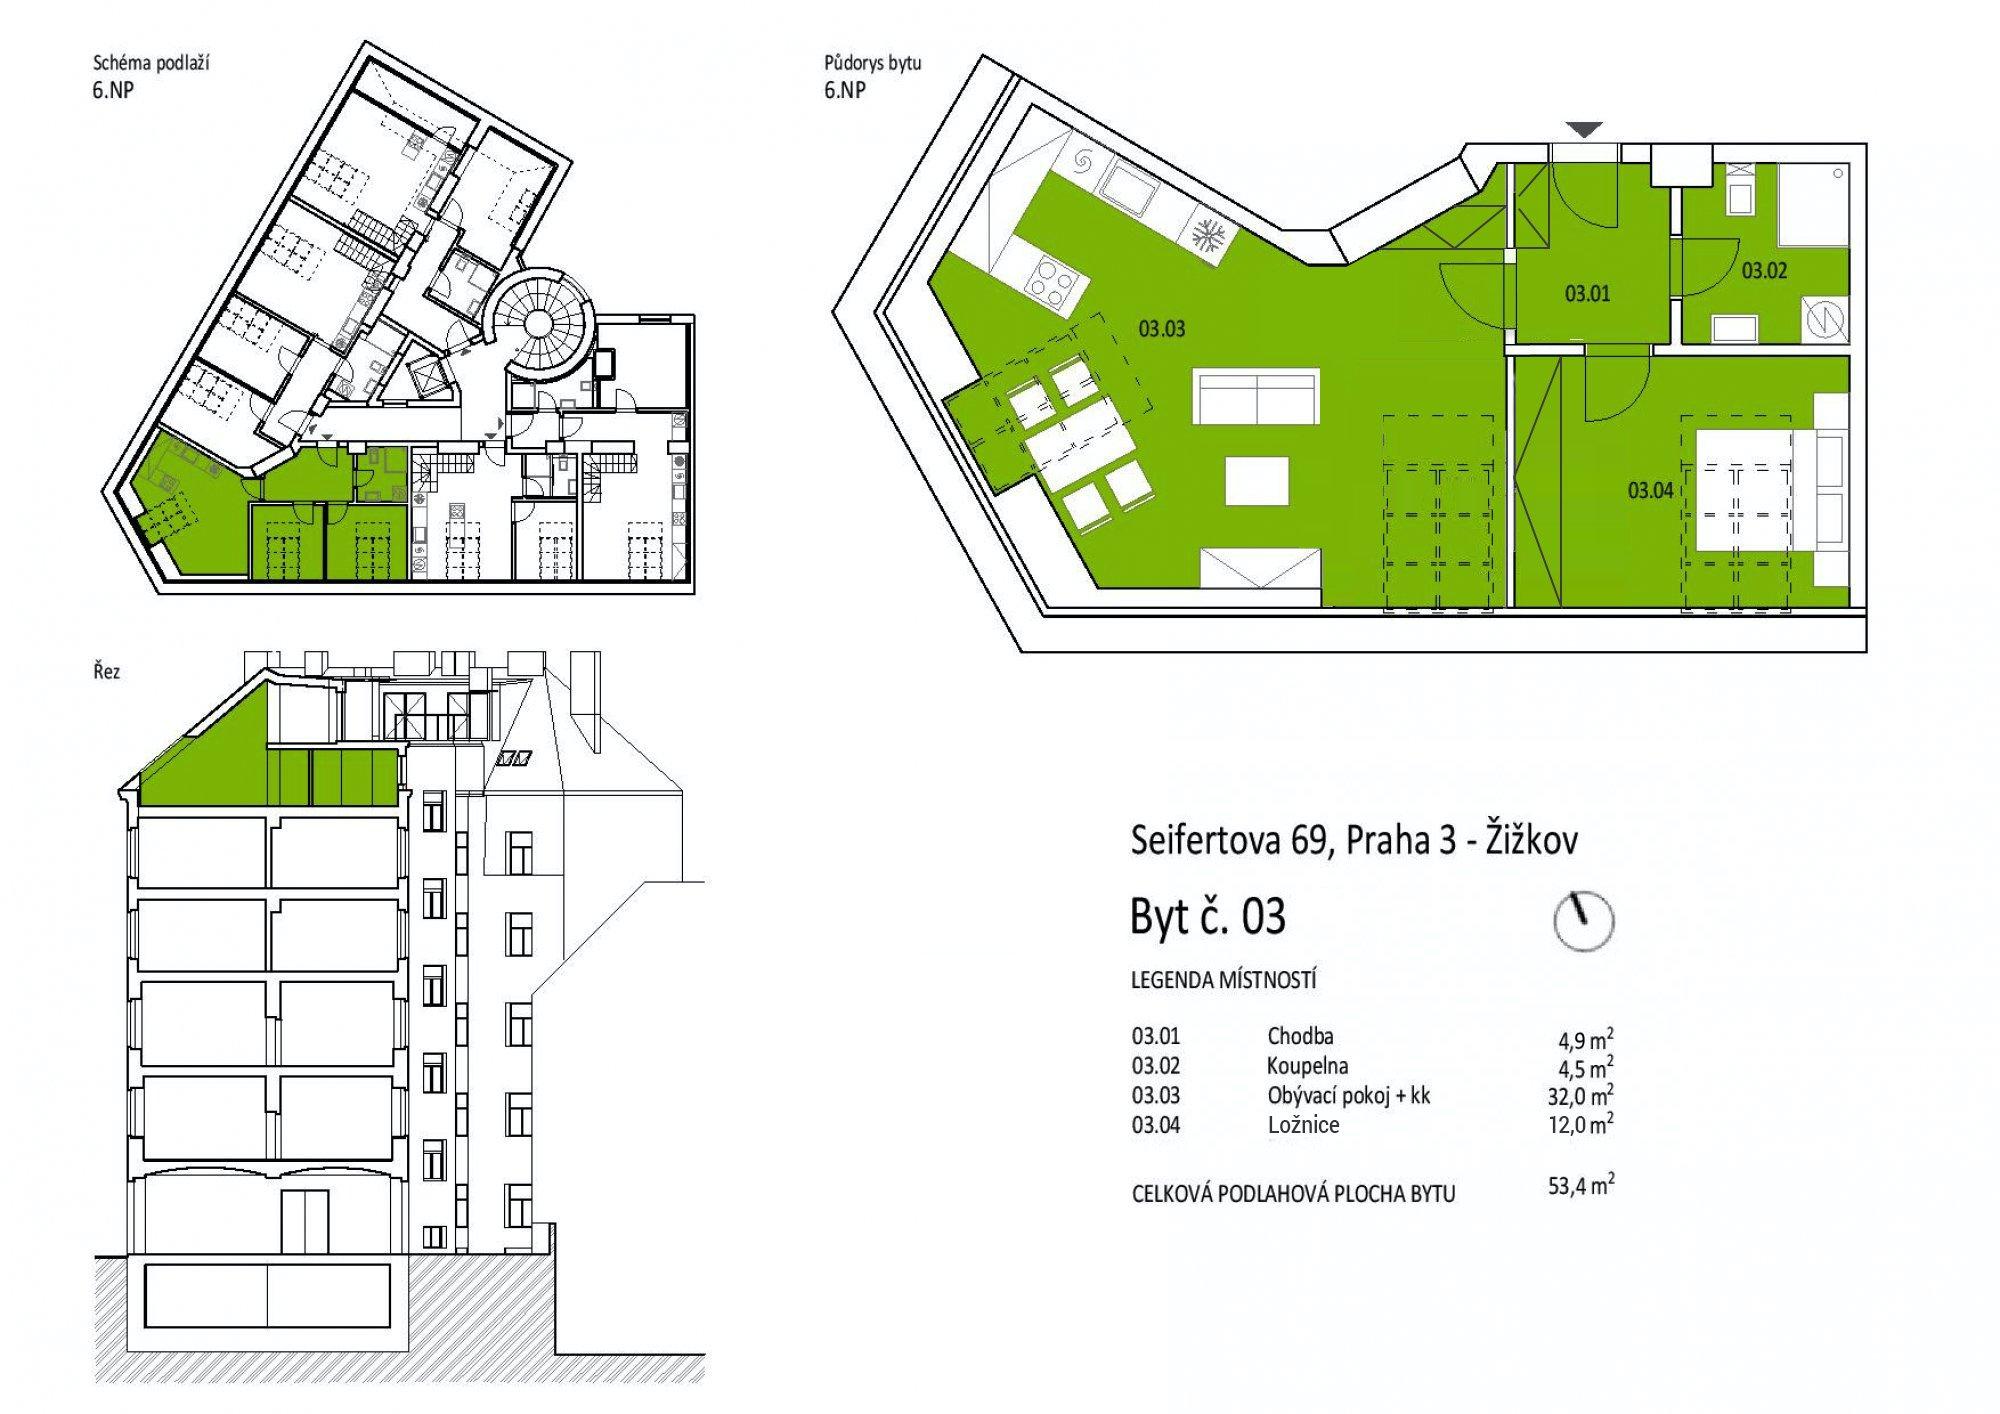 Půdorys - Půdní byt 2+kk, plocha 53 m², ulice Seifertova, Praha 3 - Žižkov